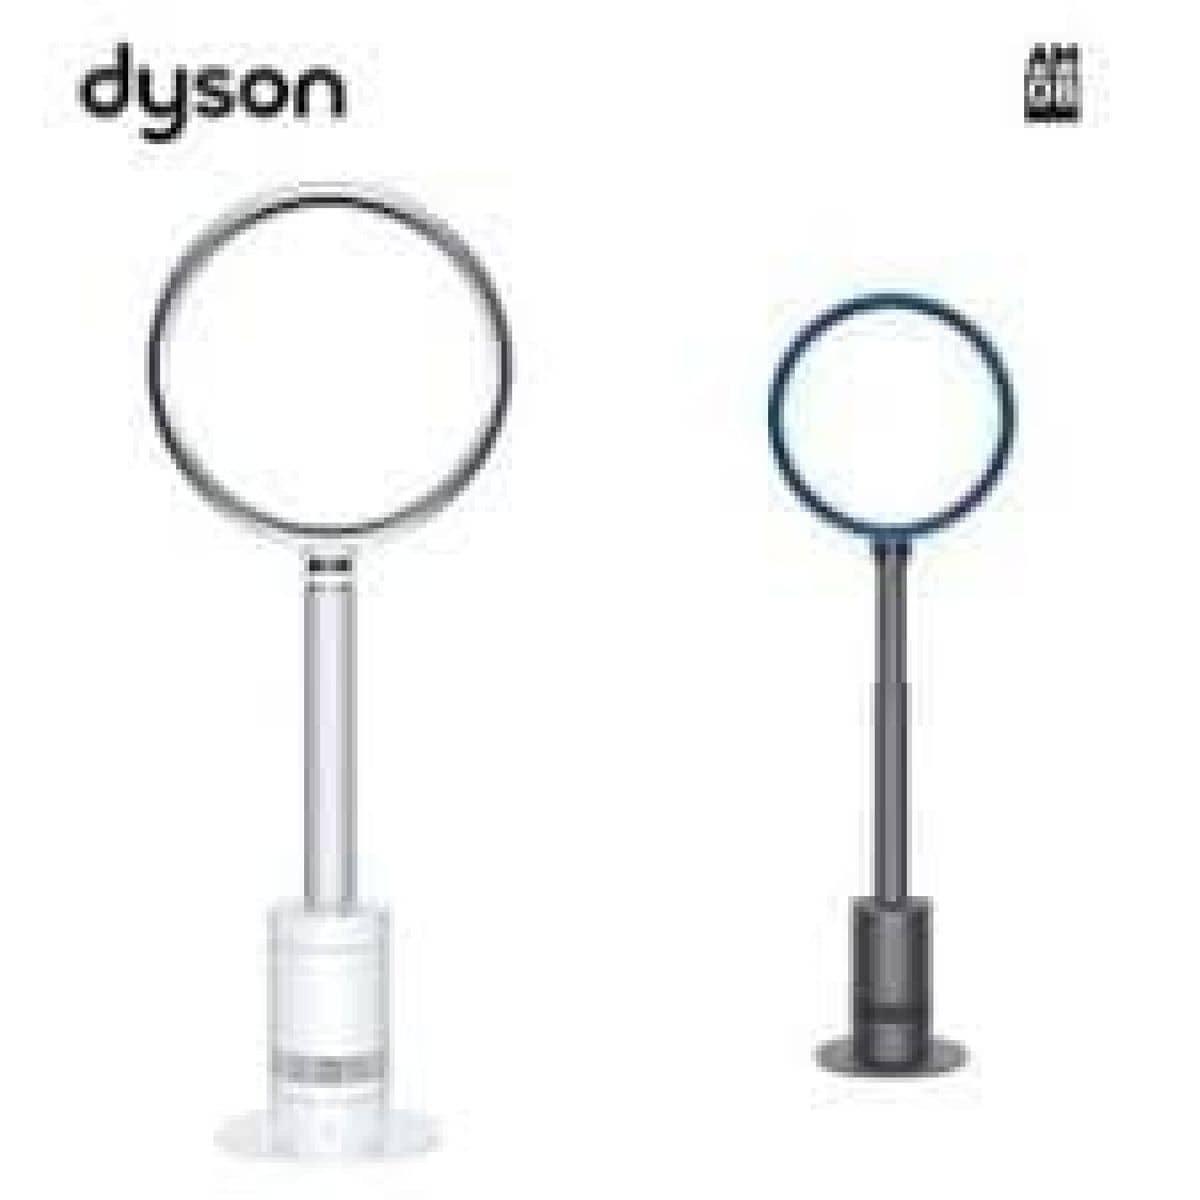 whitesilver photo dyson white fan silver on carousell pedestal p appliances home